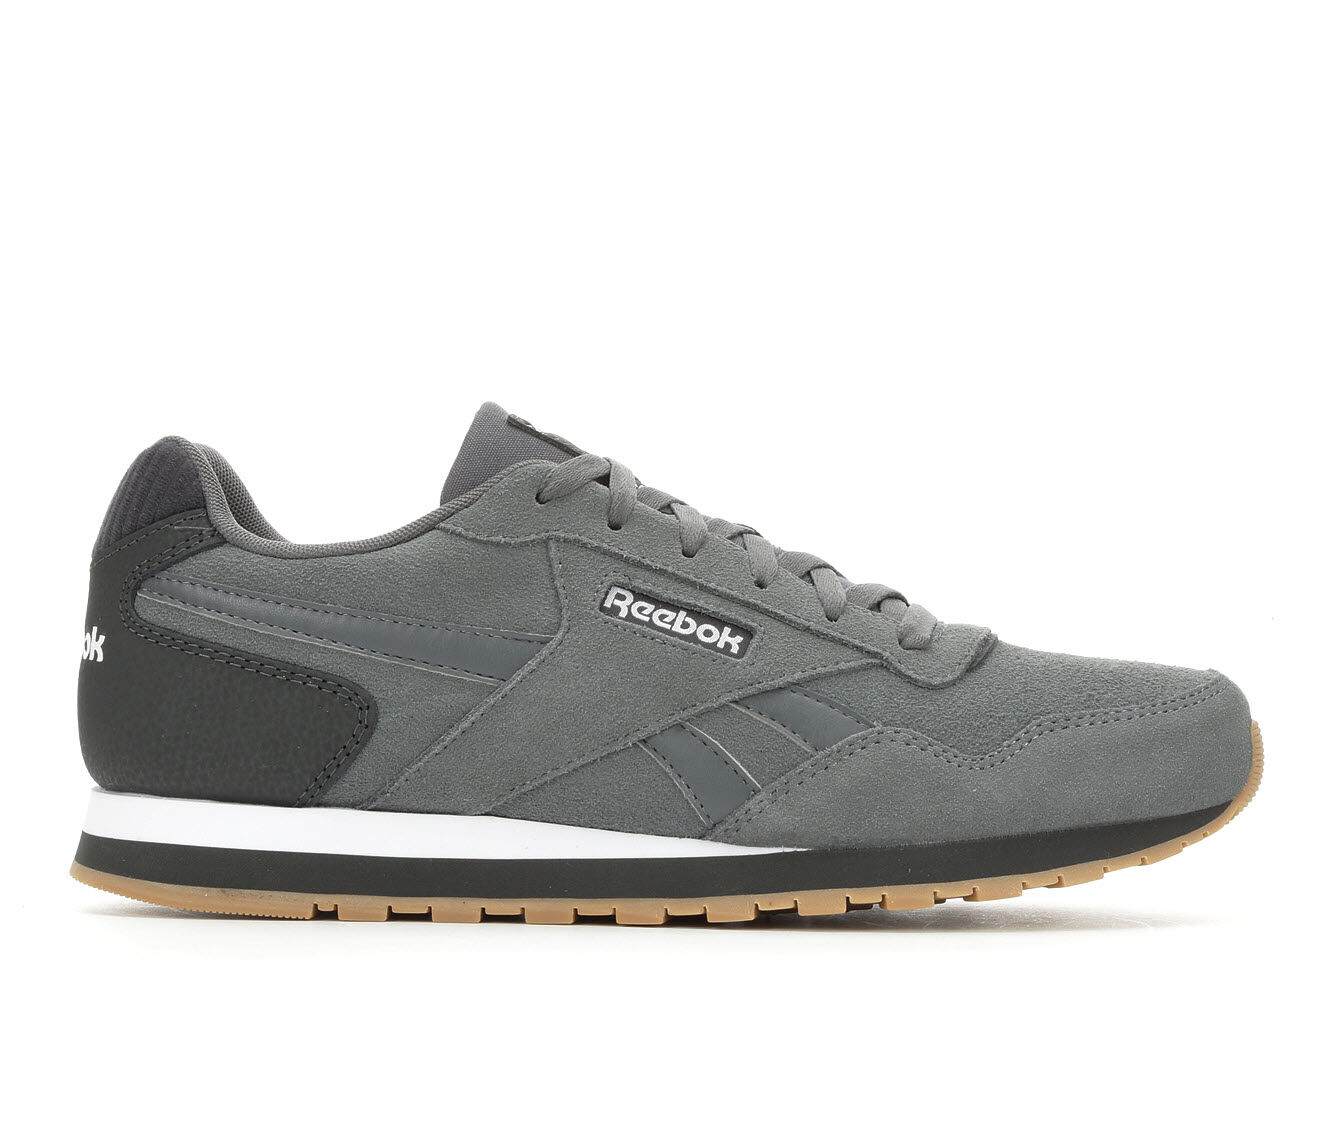 Men's Reebok Harman Retro Sneakers Gry/ Dk Gy/ Wht